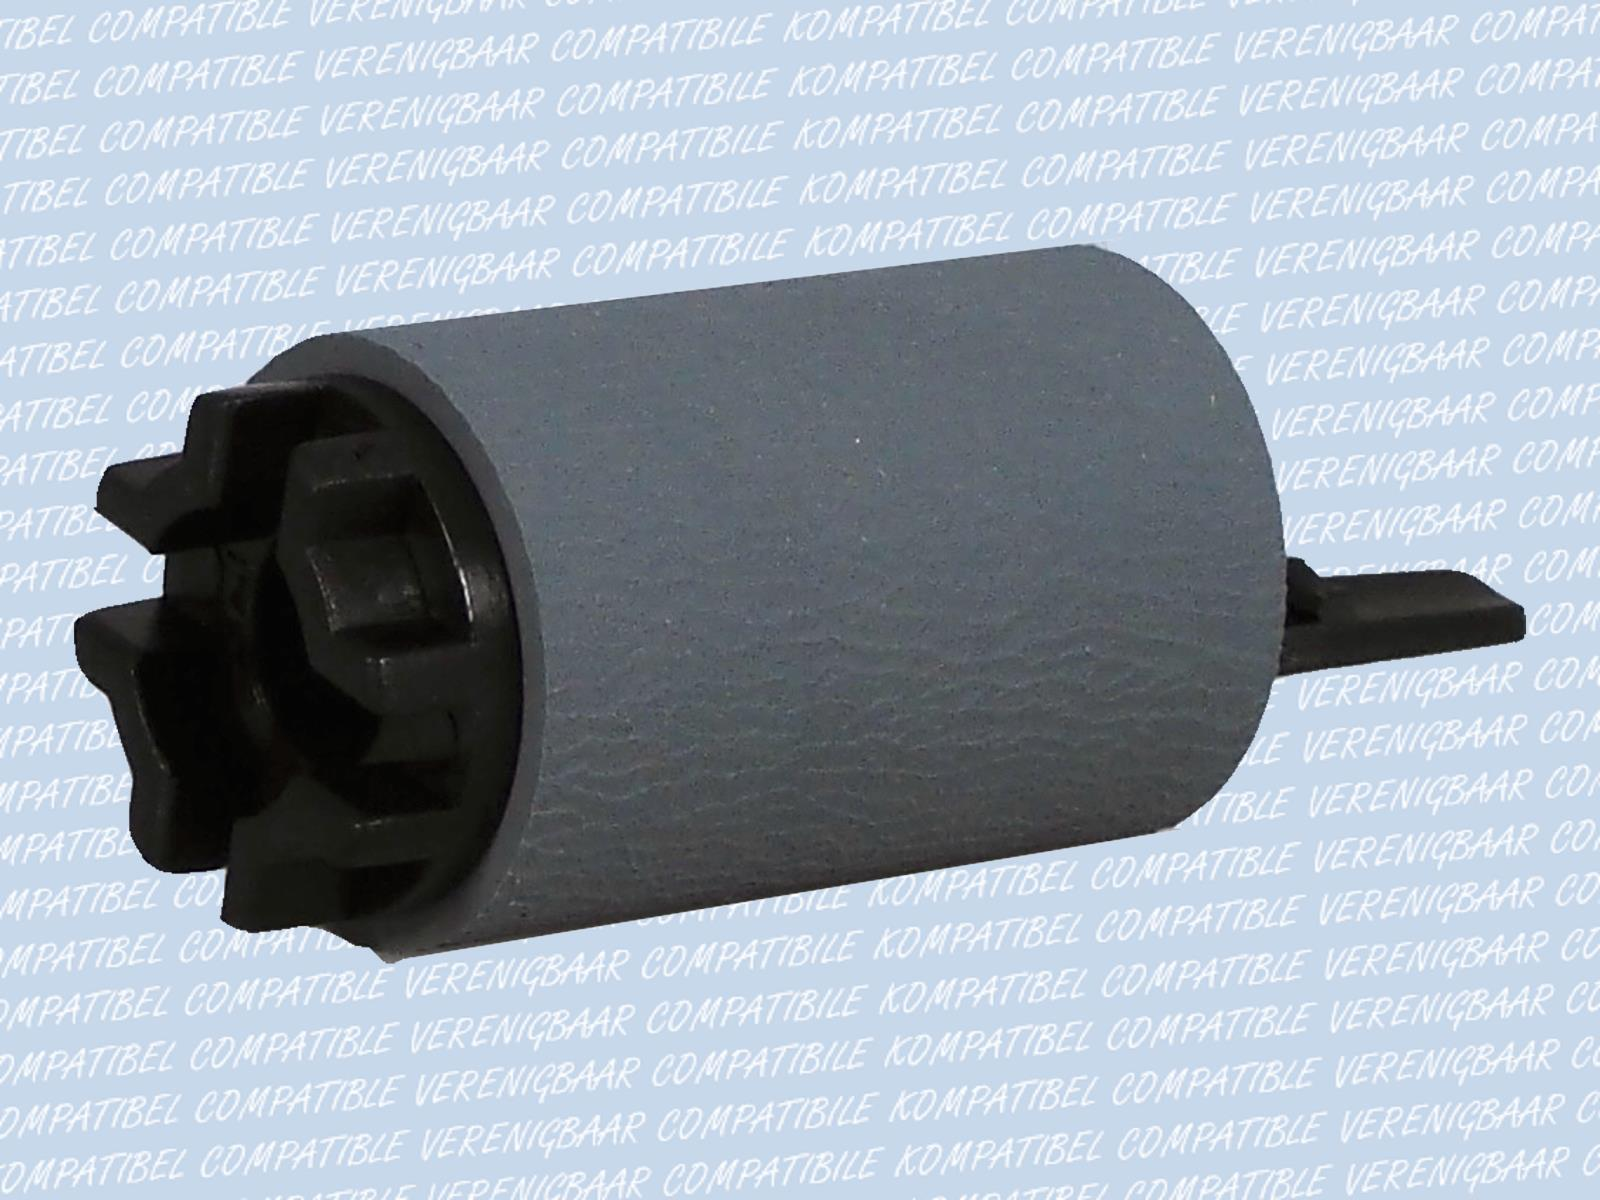 Compatible Paper Feed Roller Typ: 302ND94340 for Kyocera TASKalfa: 2552ci /  3252ci / 4002i / 4052ci / 5002i / 5052ci / 6002i / 6052ci